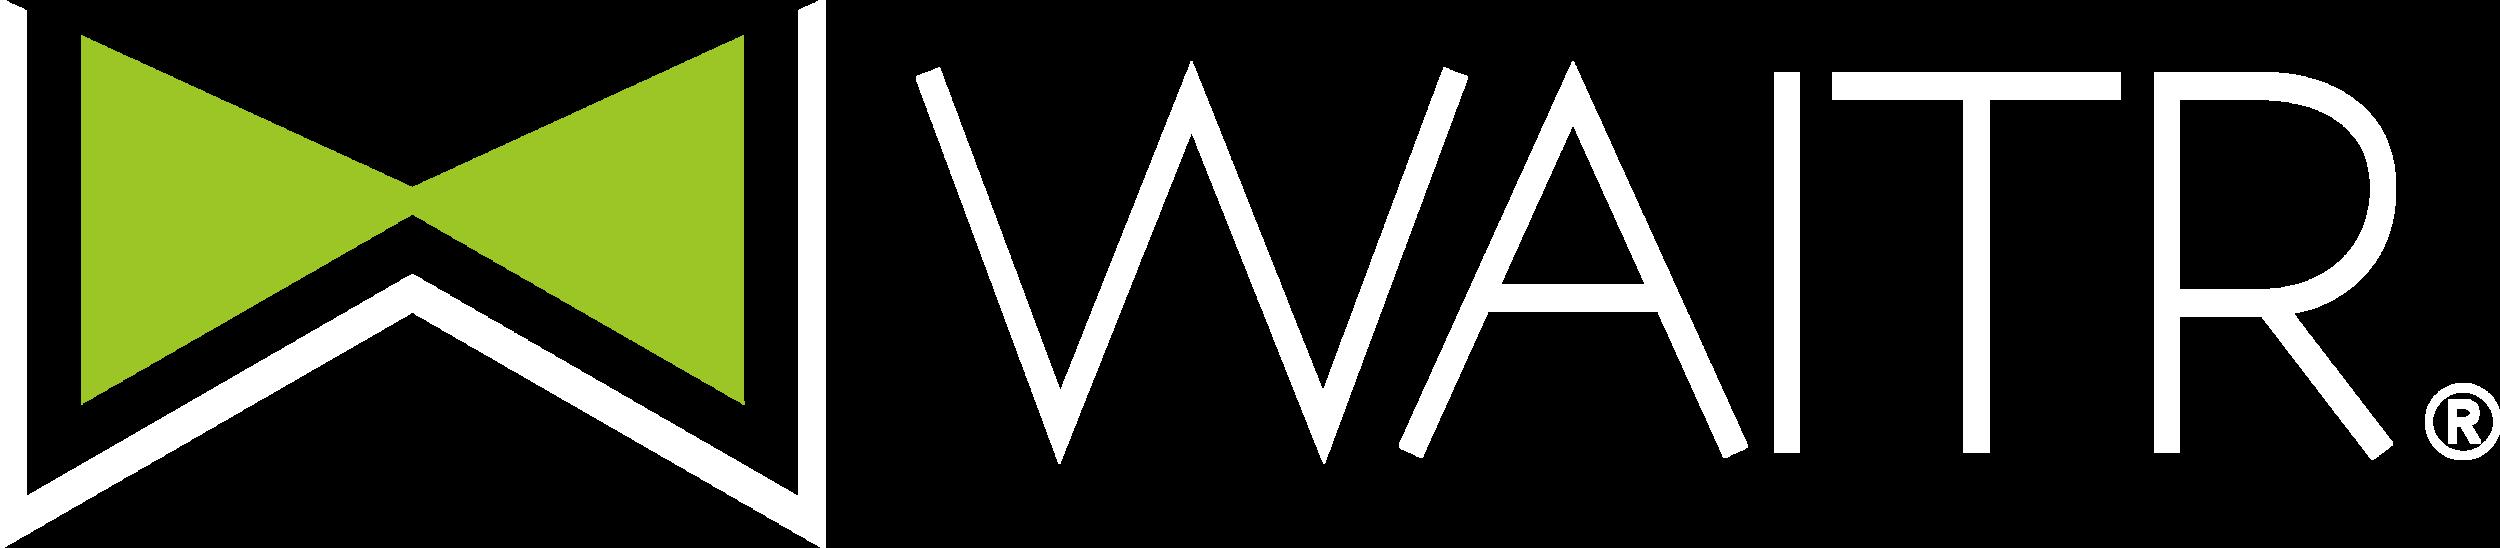 Waitr_Linear_RGB_DarkBG.png